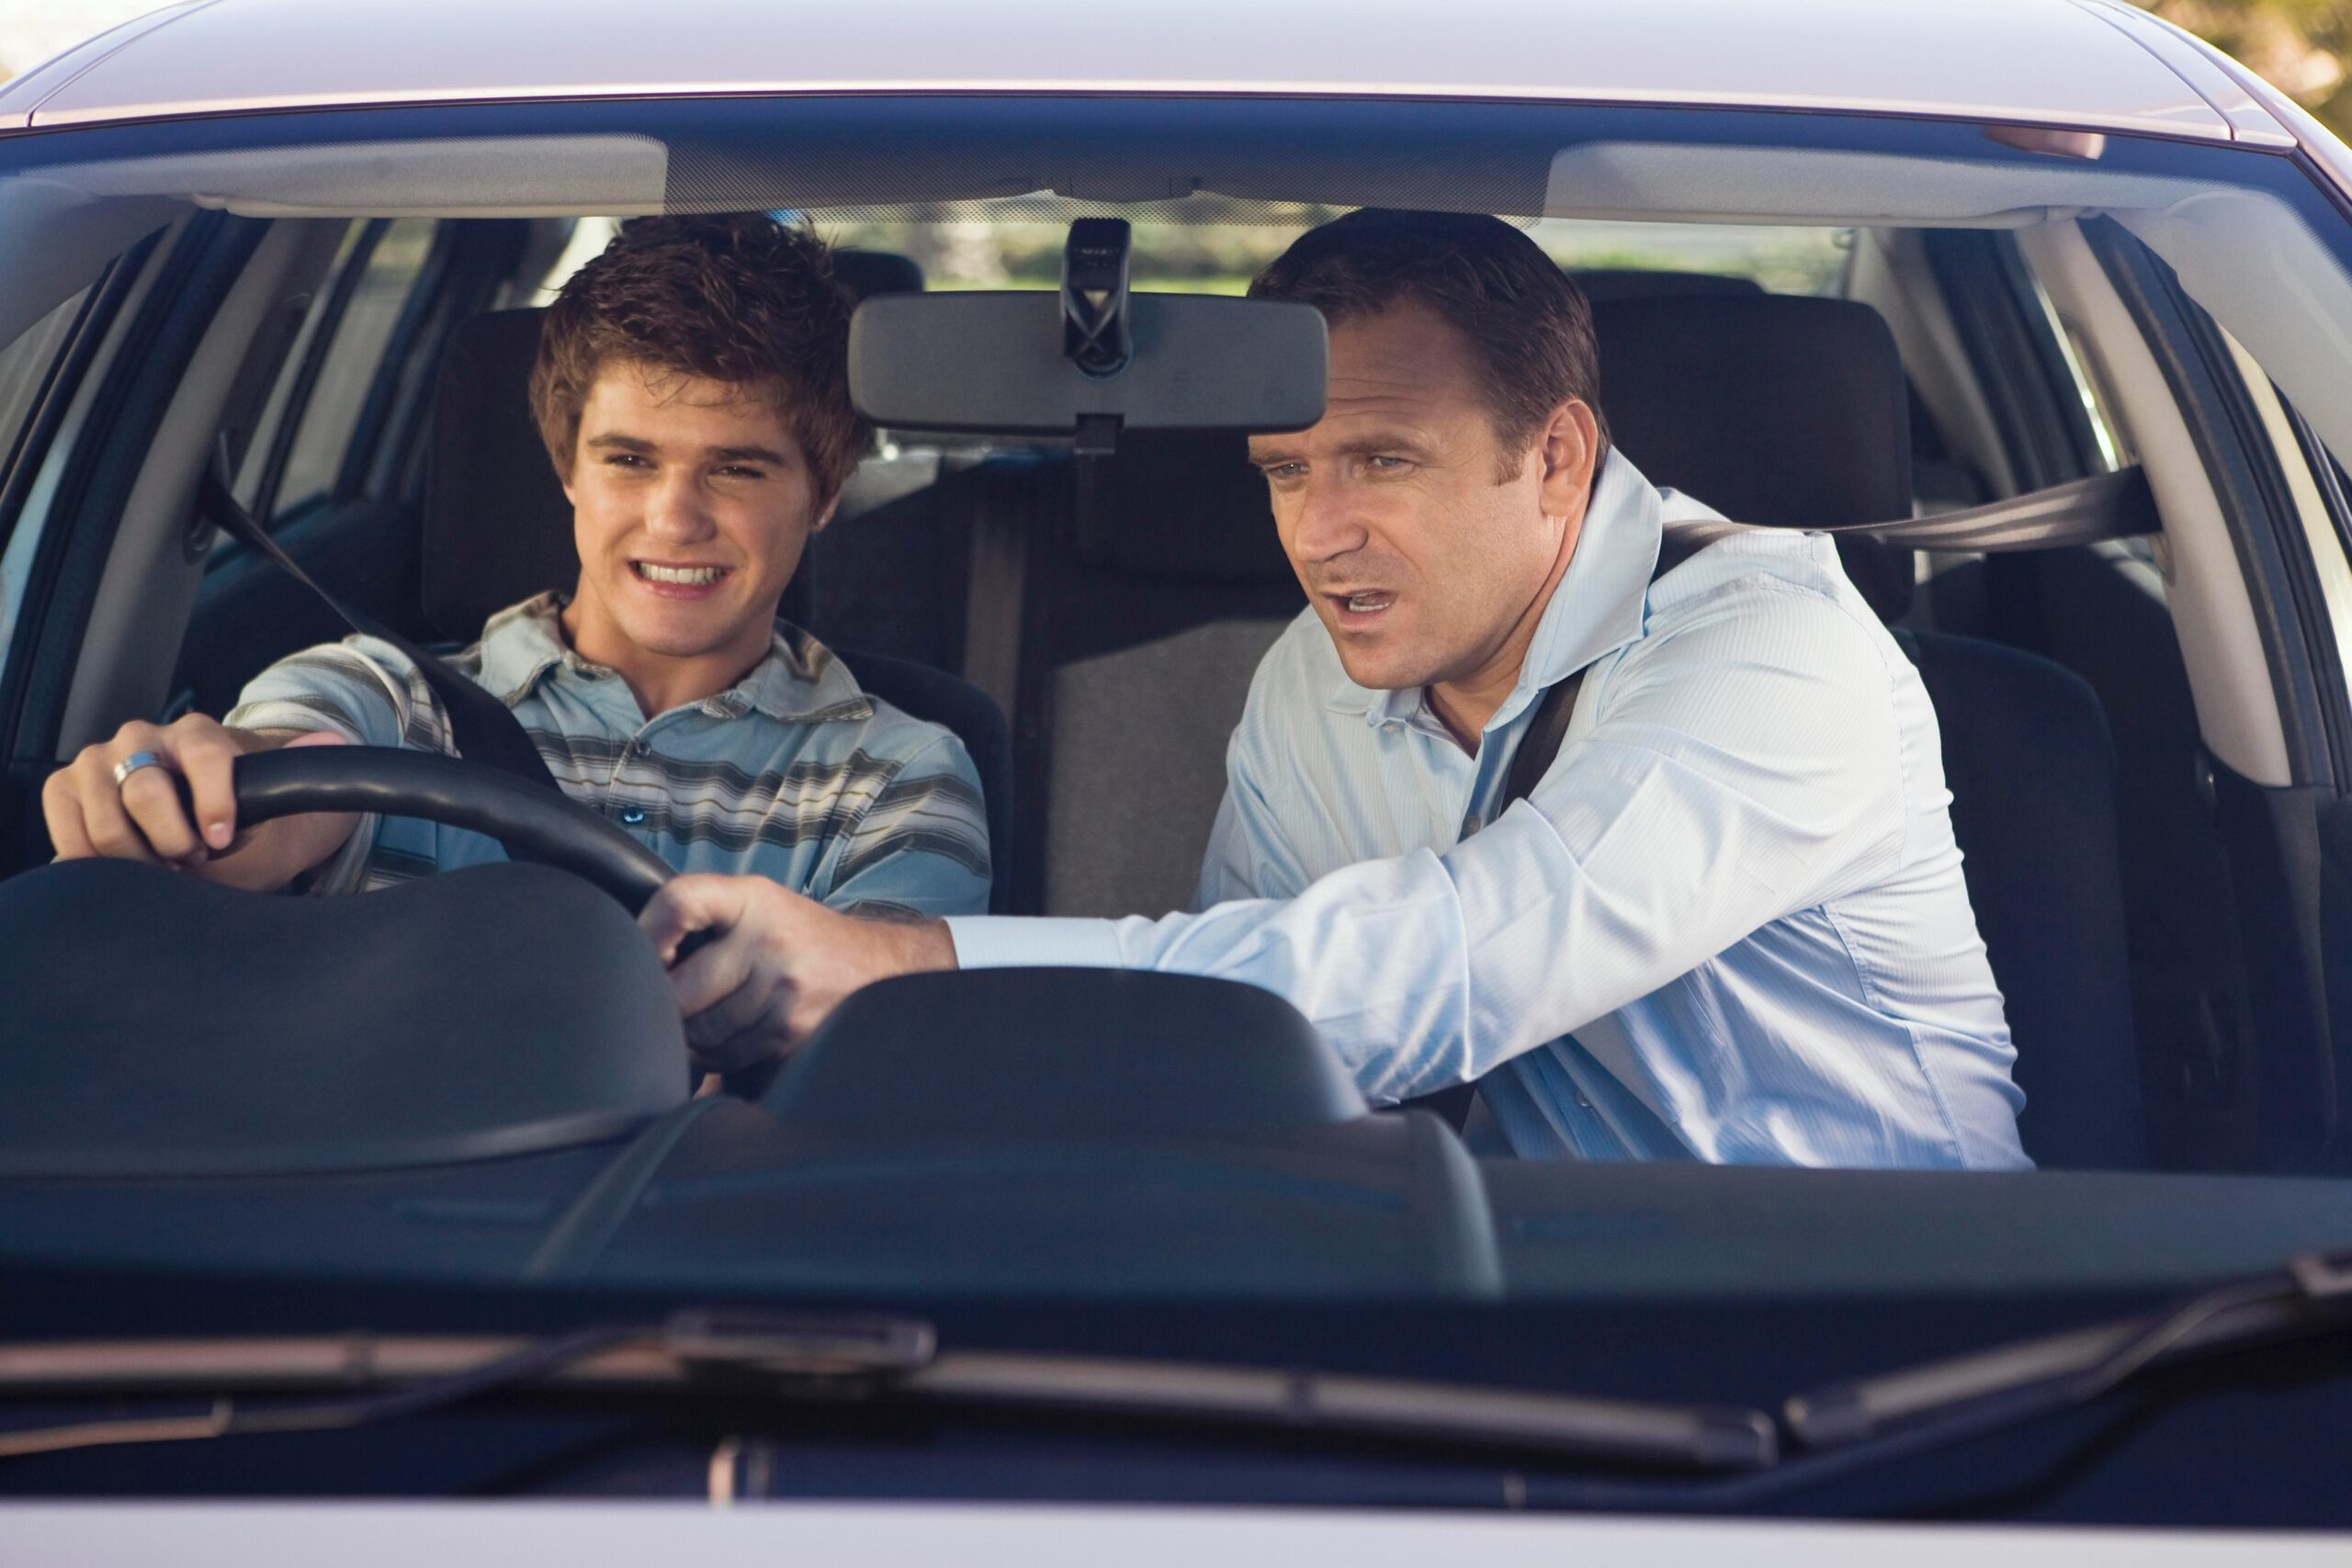 Driver Instructor Calgary